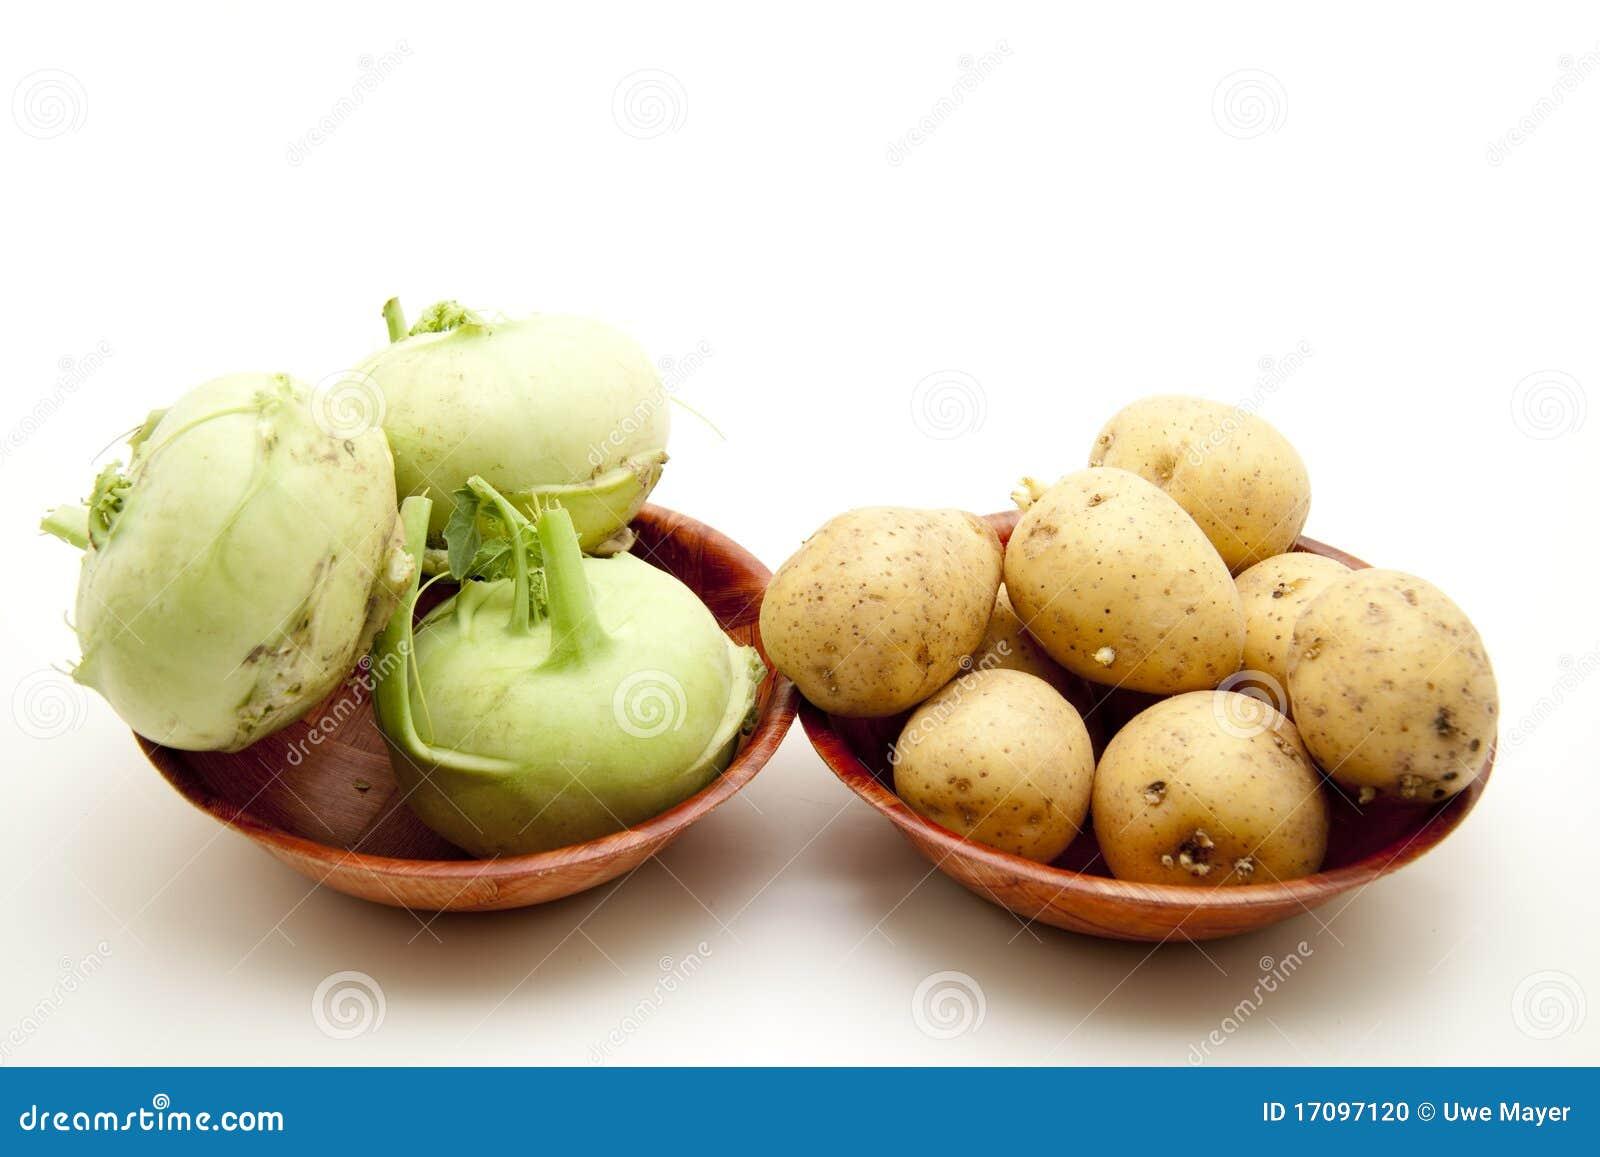 Kohlrabi mit Kartoffel